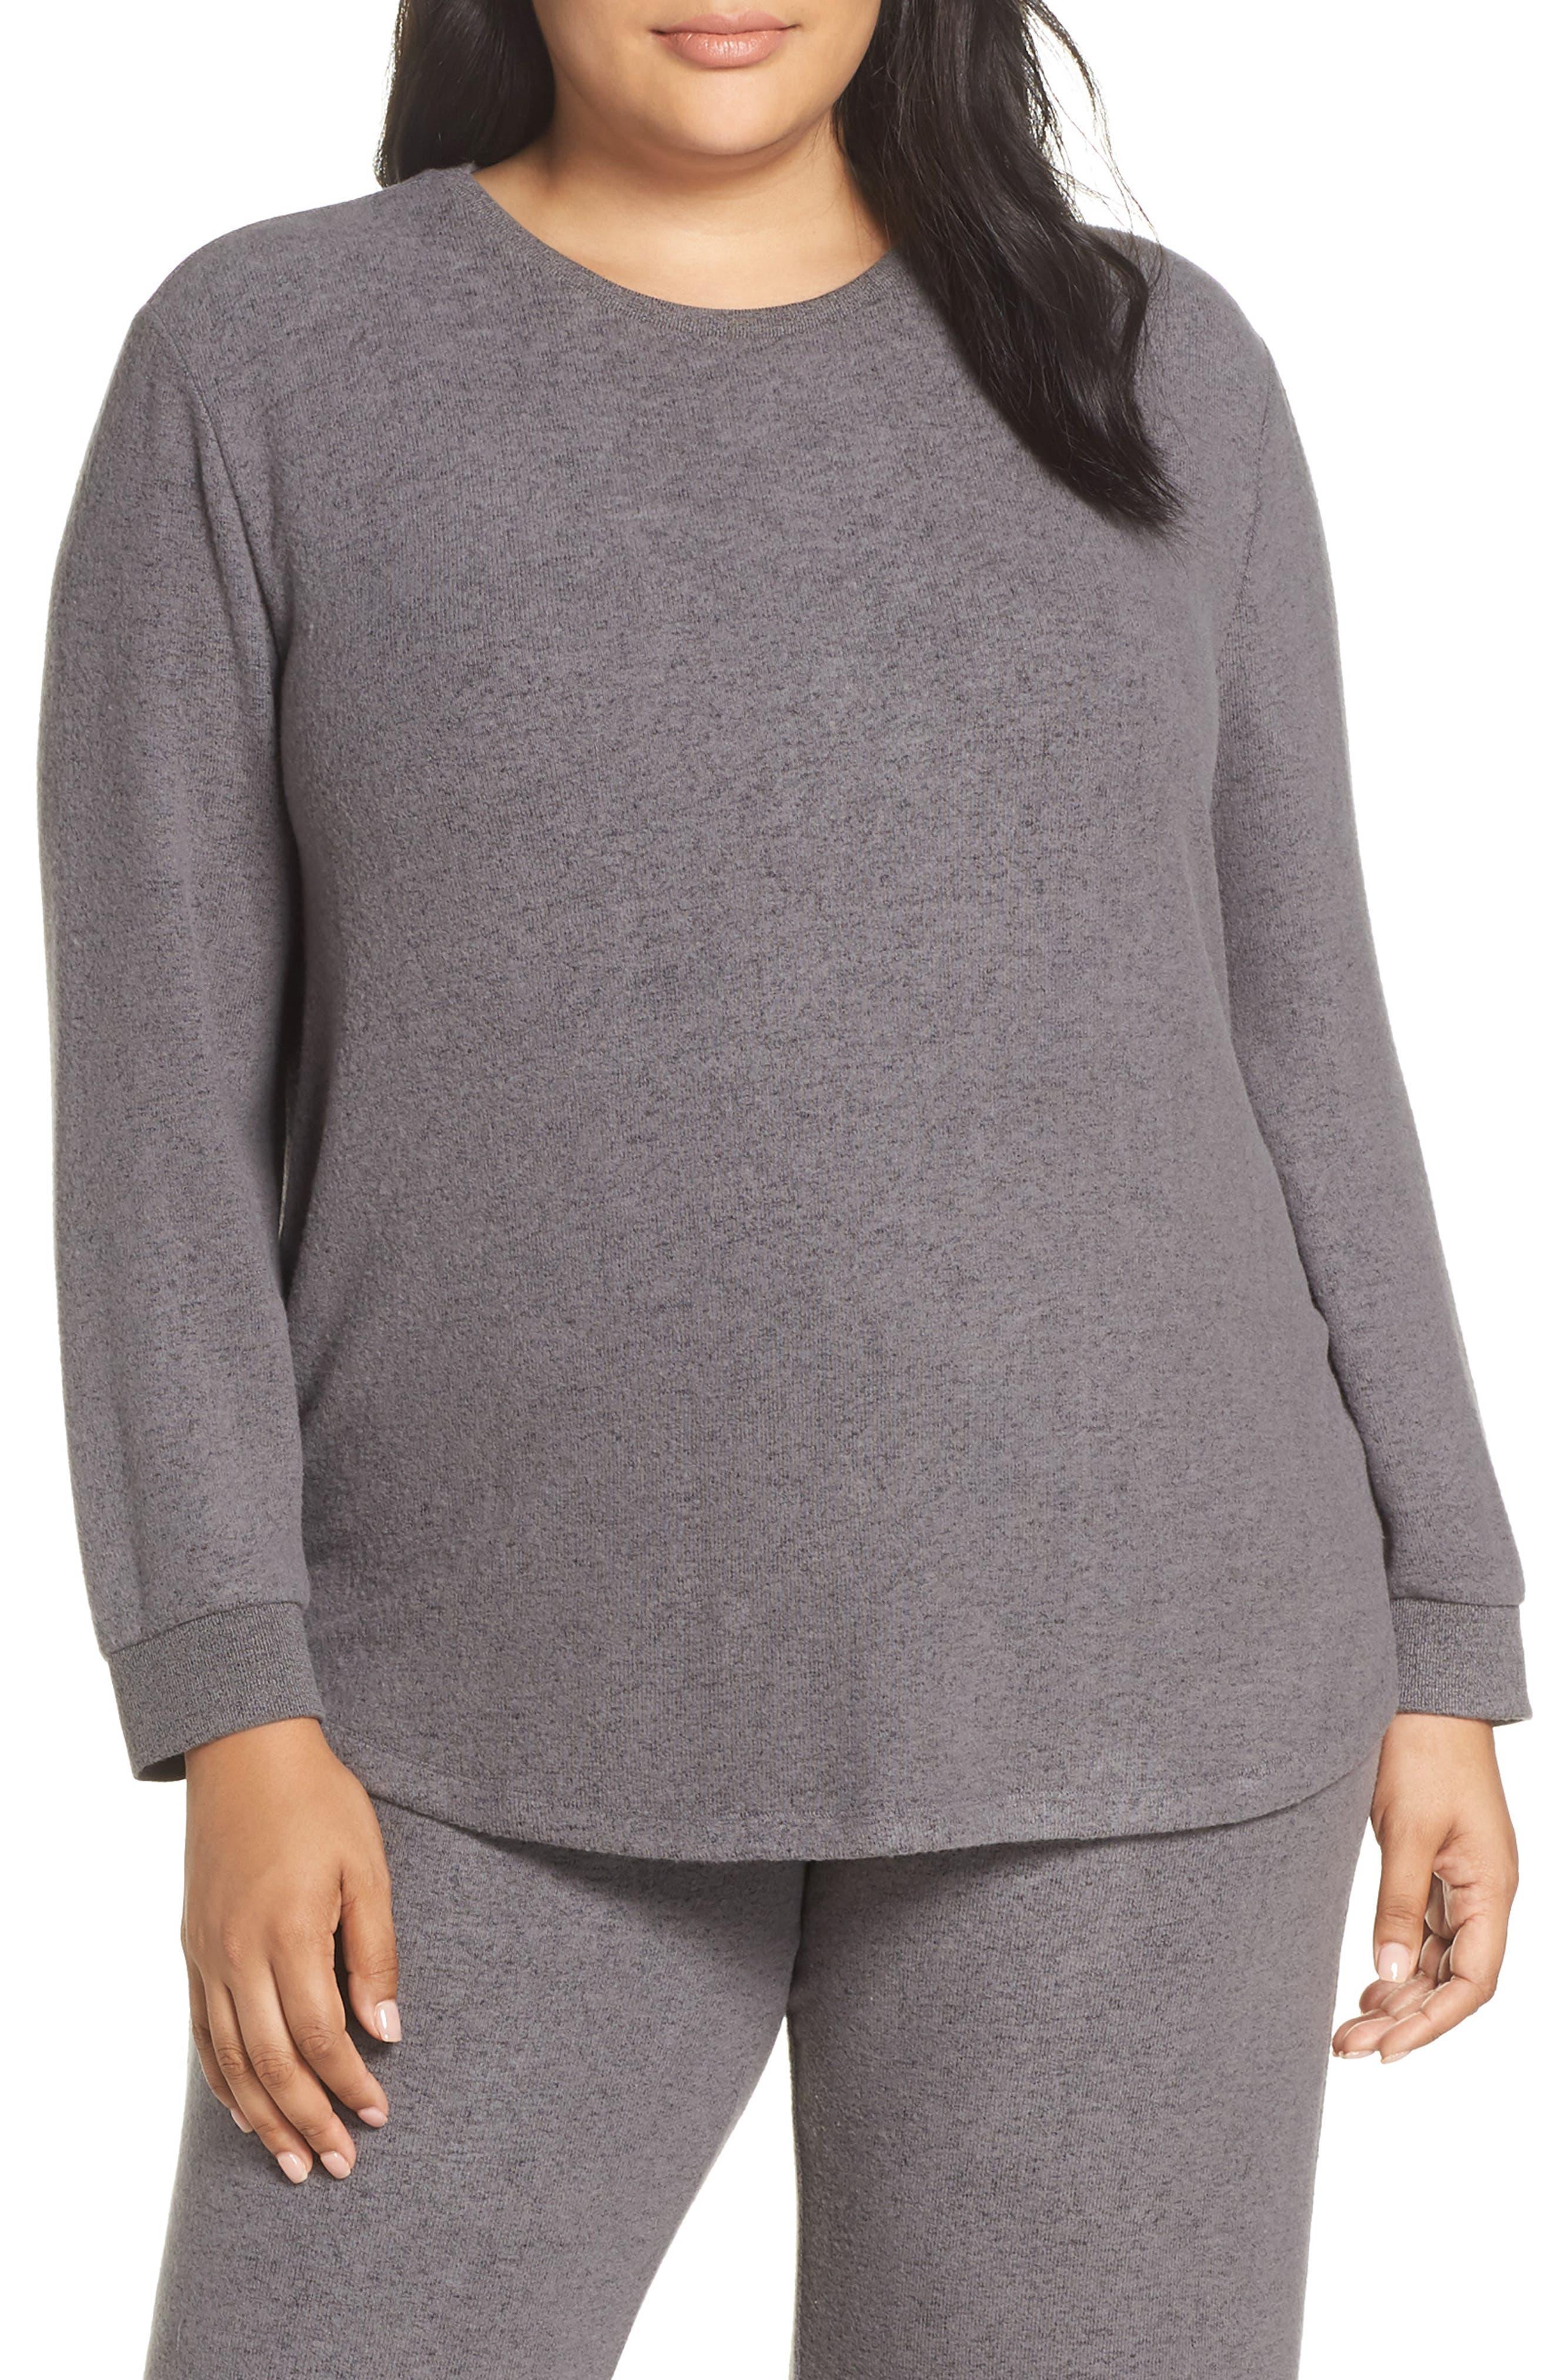 Too Cool Pullover,                             Main thumbnail 1, color,                             GREY PAVEMENT MARL